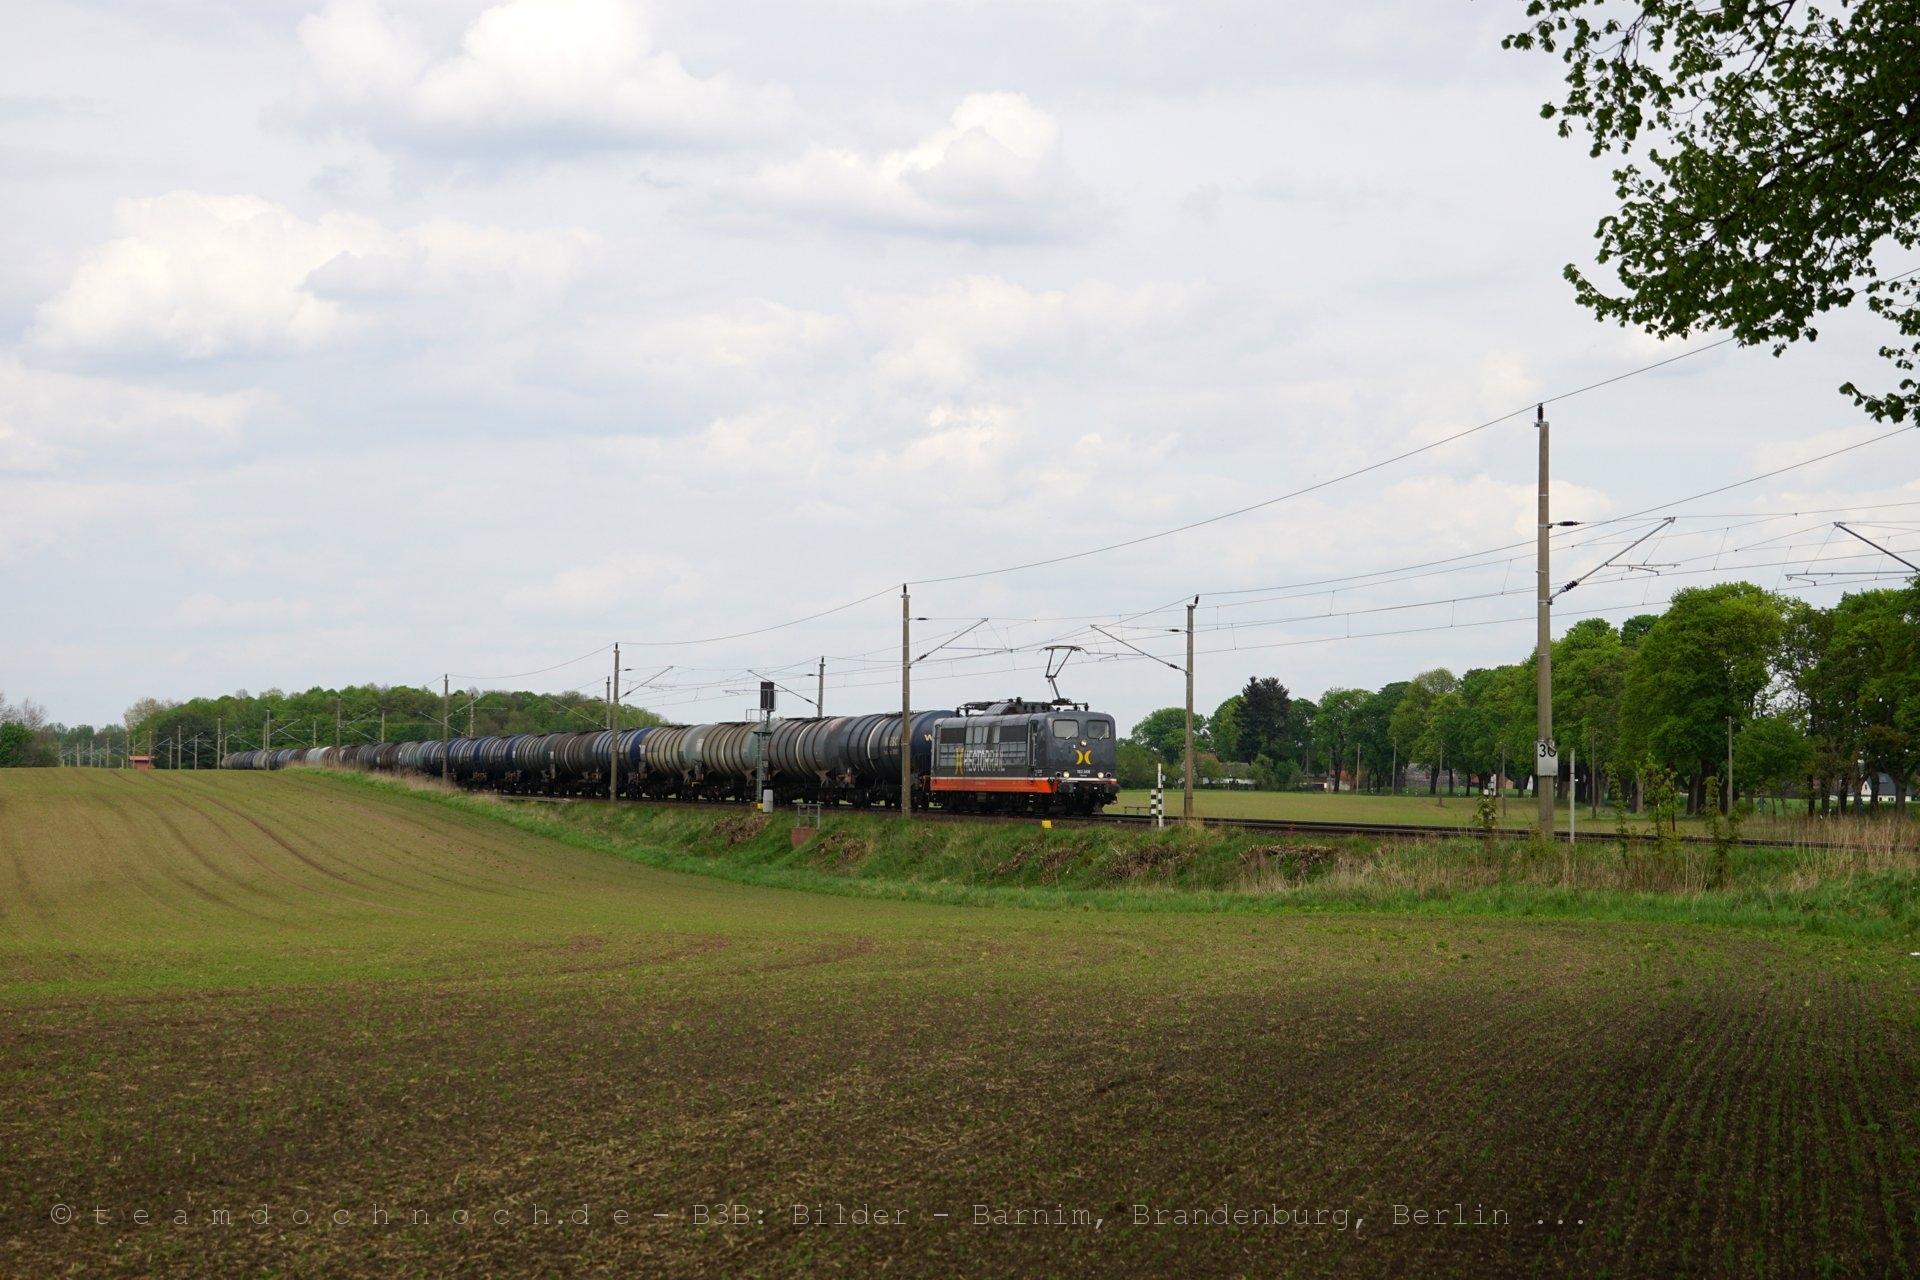 Hectorrail 162.006 am Bahnübergang Rüdnitz – Danewitz (K6005)